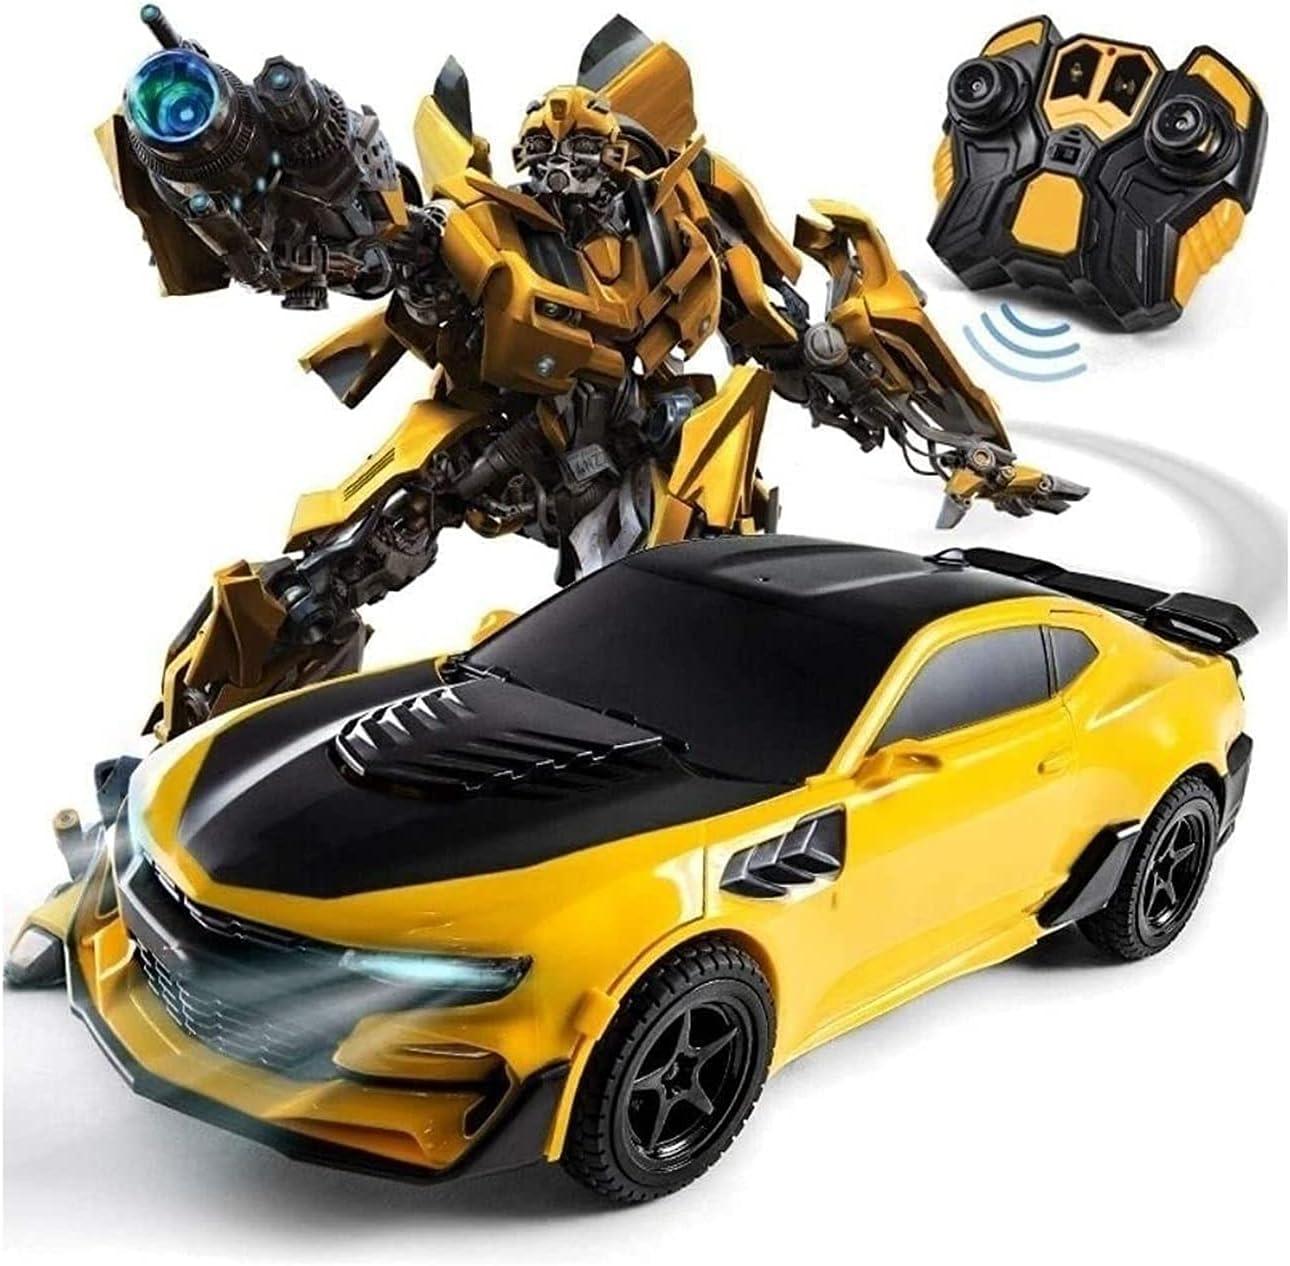 New product type ELXSZJ XTZJ price RC Cars Robot for Car Kids Transformr Control Remote